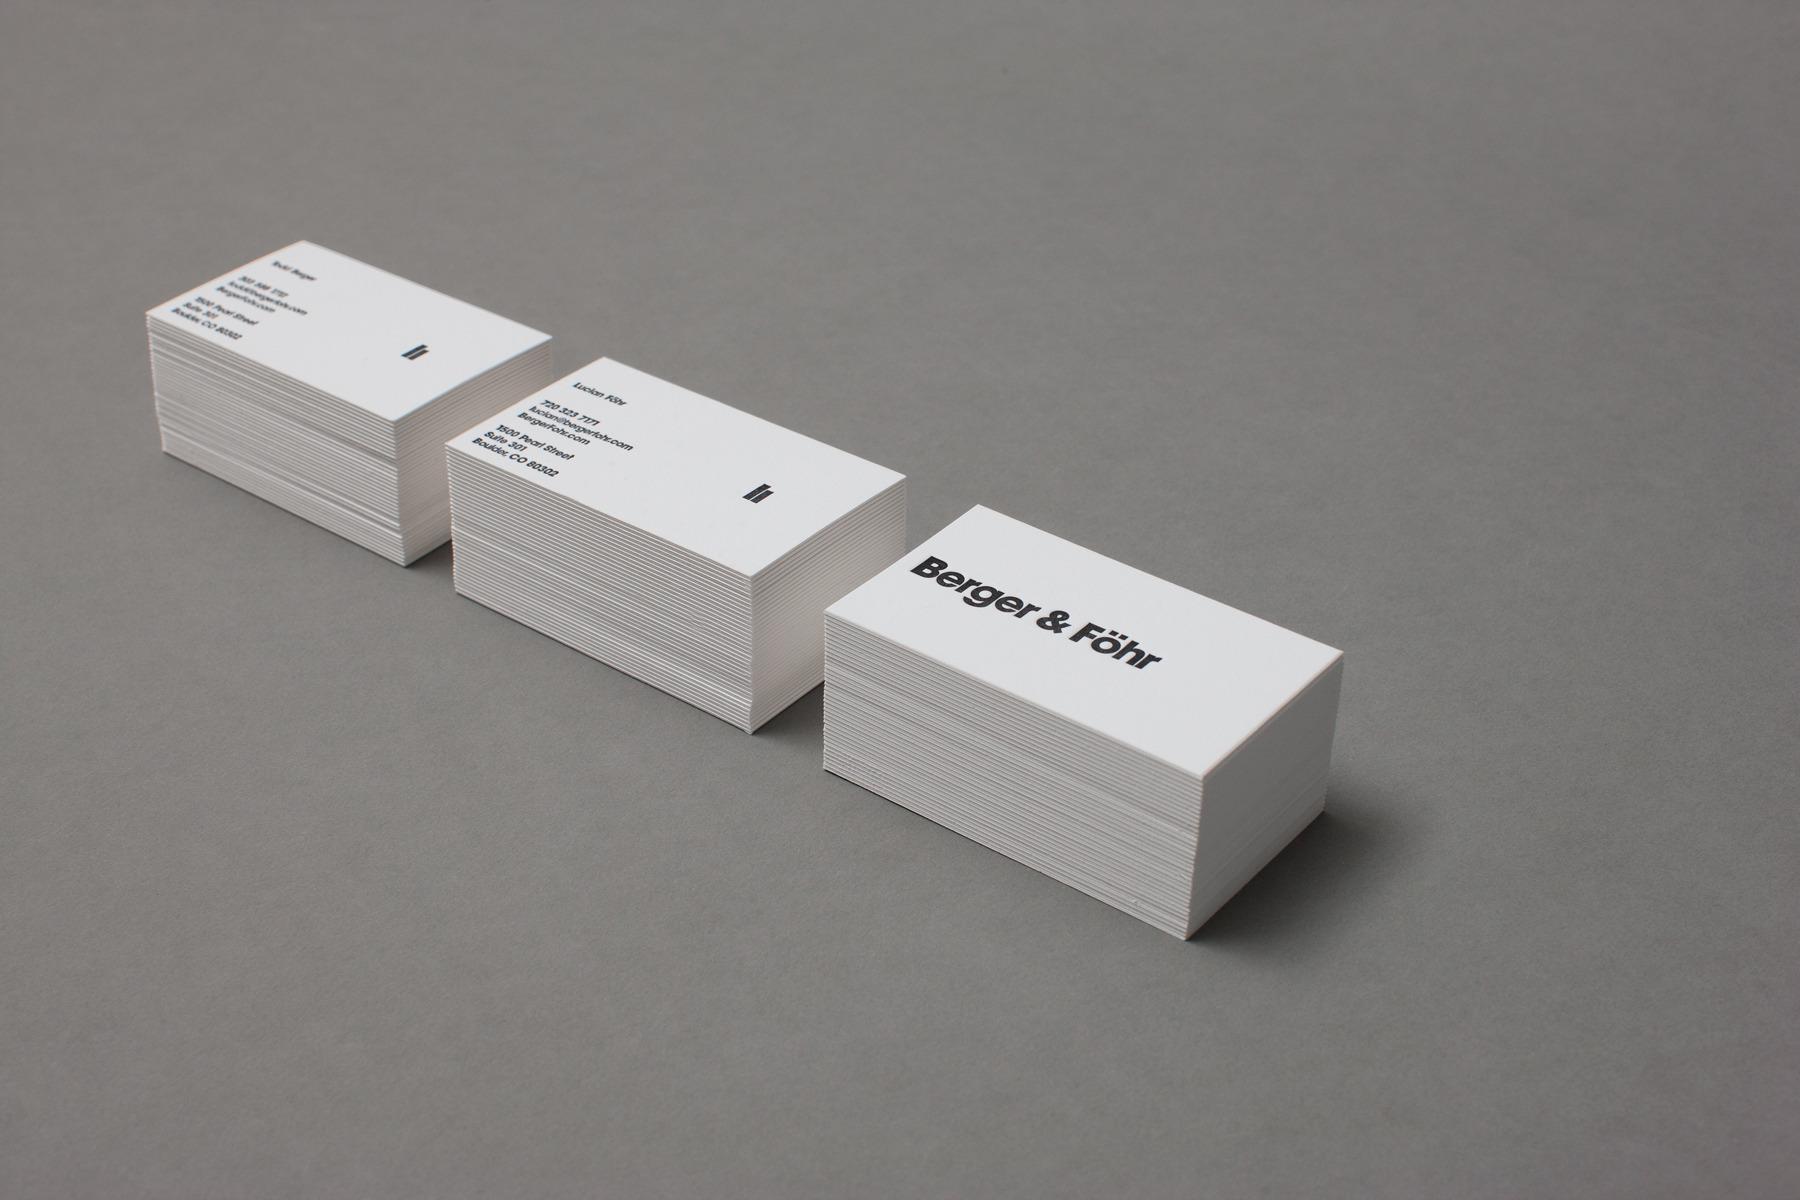 B&F Studio Collateral — Berger & Föhr — Design & Art Direction